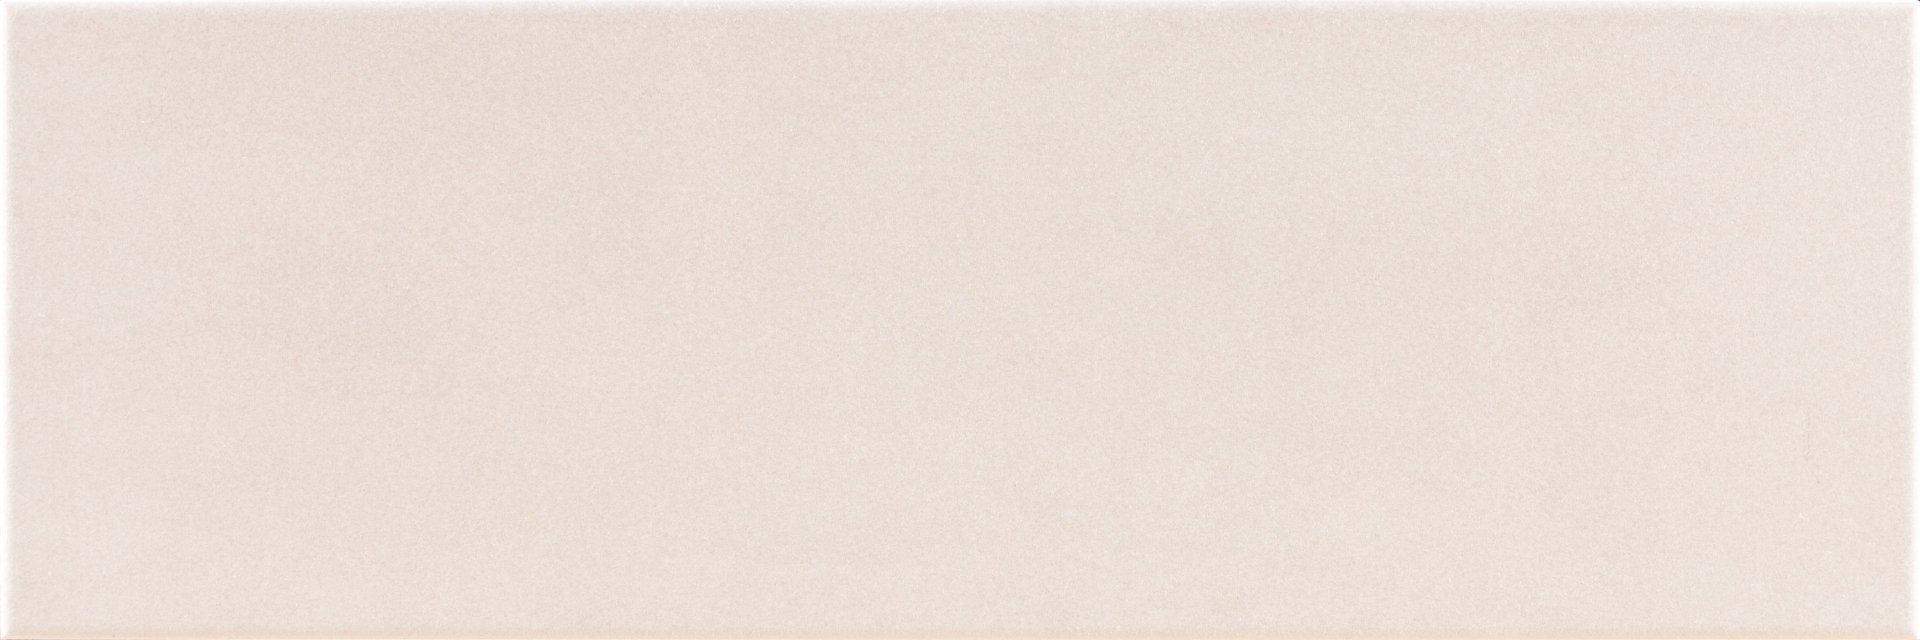 Faianță pentru baie Pamesa Hayden Neutro 200x600 satin gri / 9